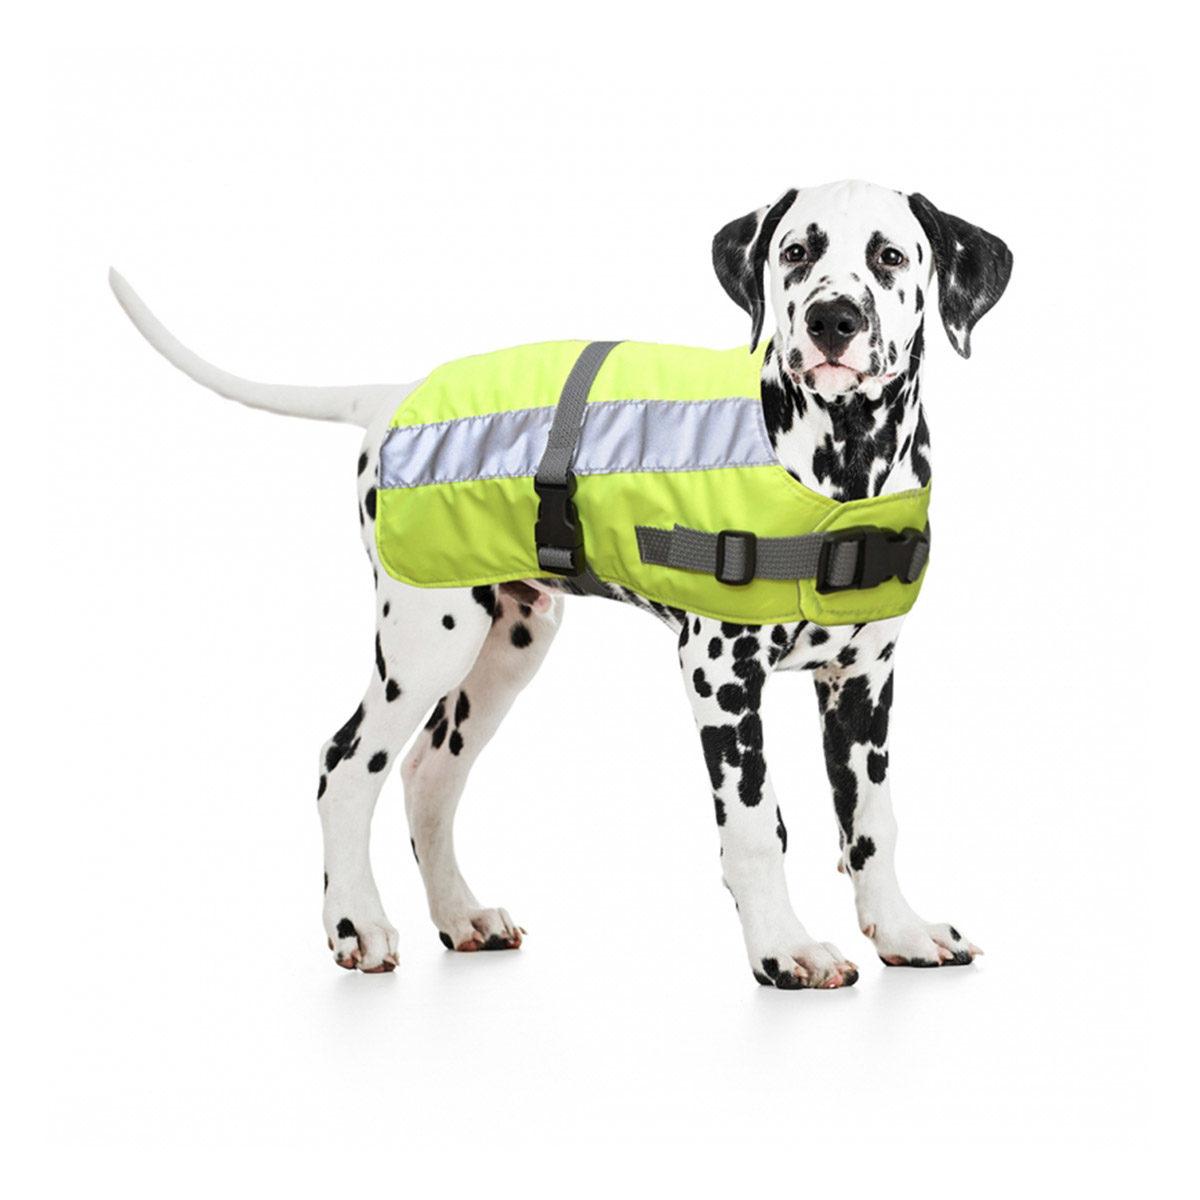 Duvo+ Flectalon Hi Vis Honden Jack Ruglengte 70 cm Geel - in Reflectie & Verlichting